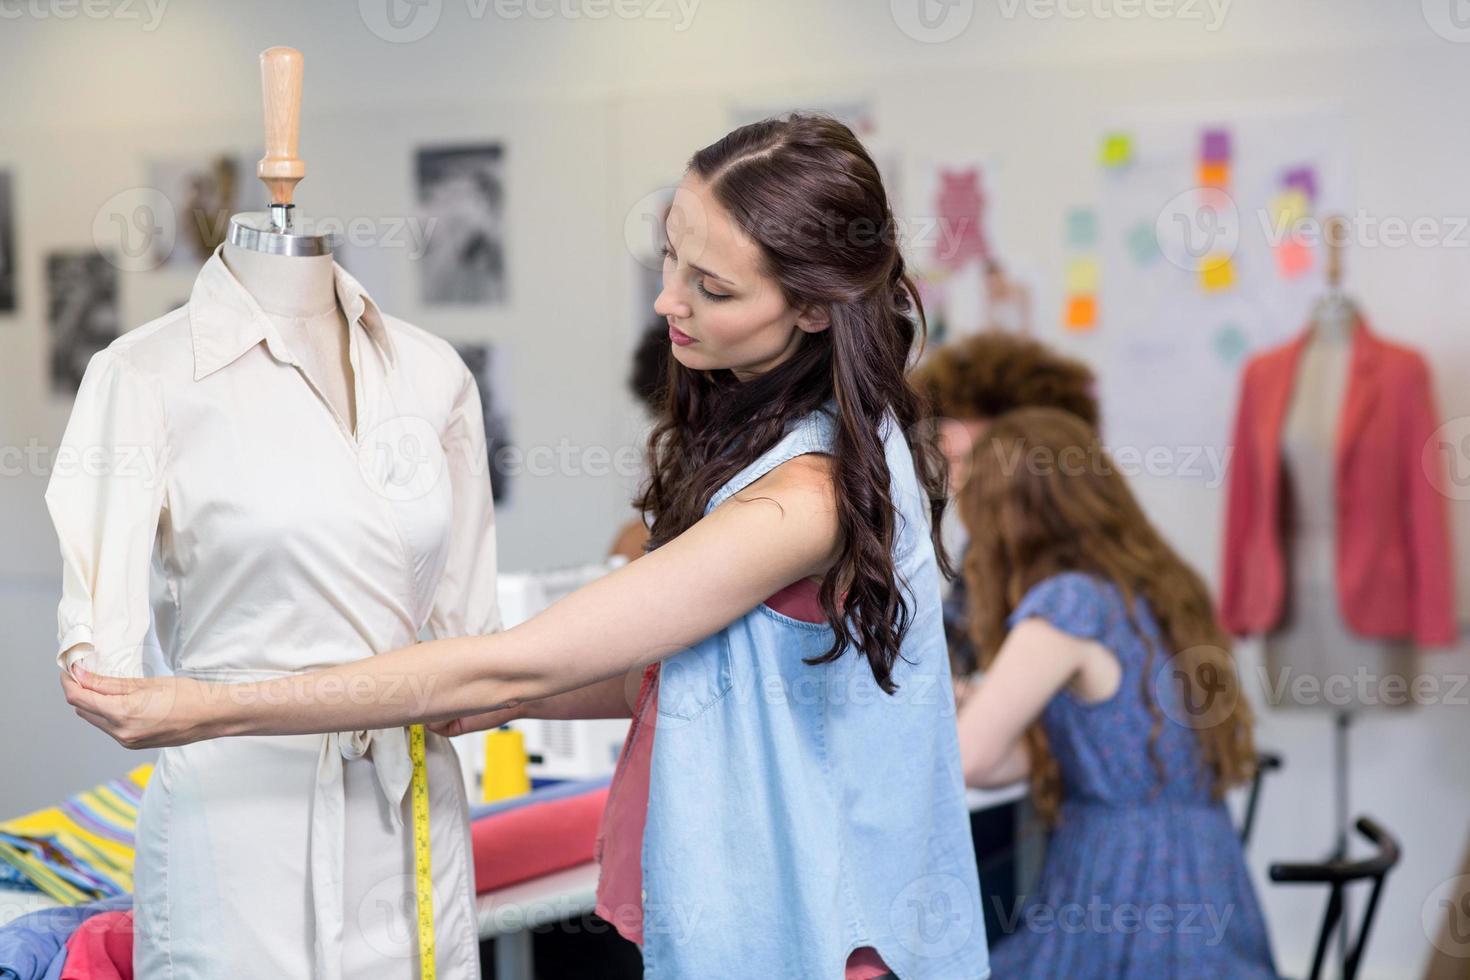 selbstbewusste Modedesignerin foto